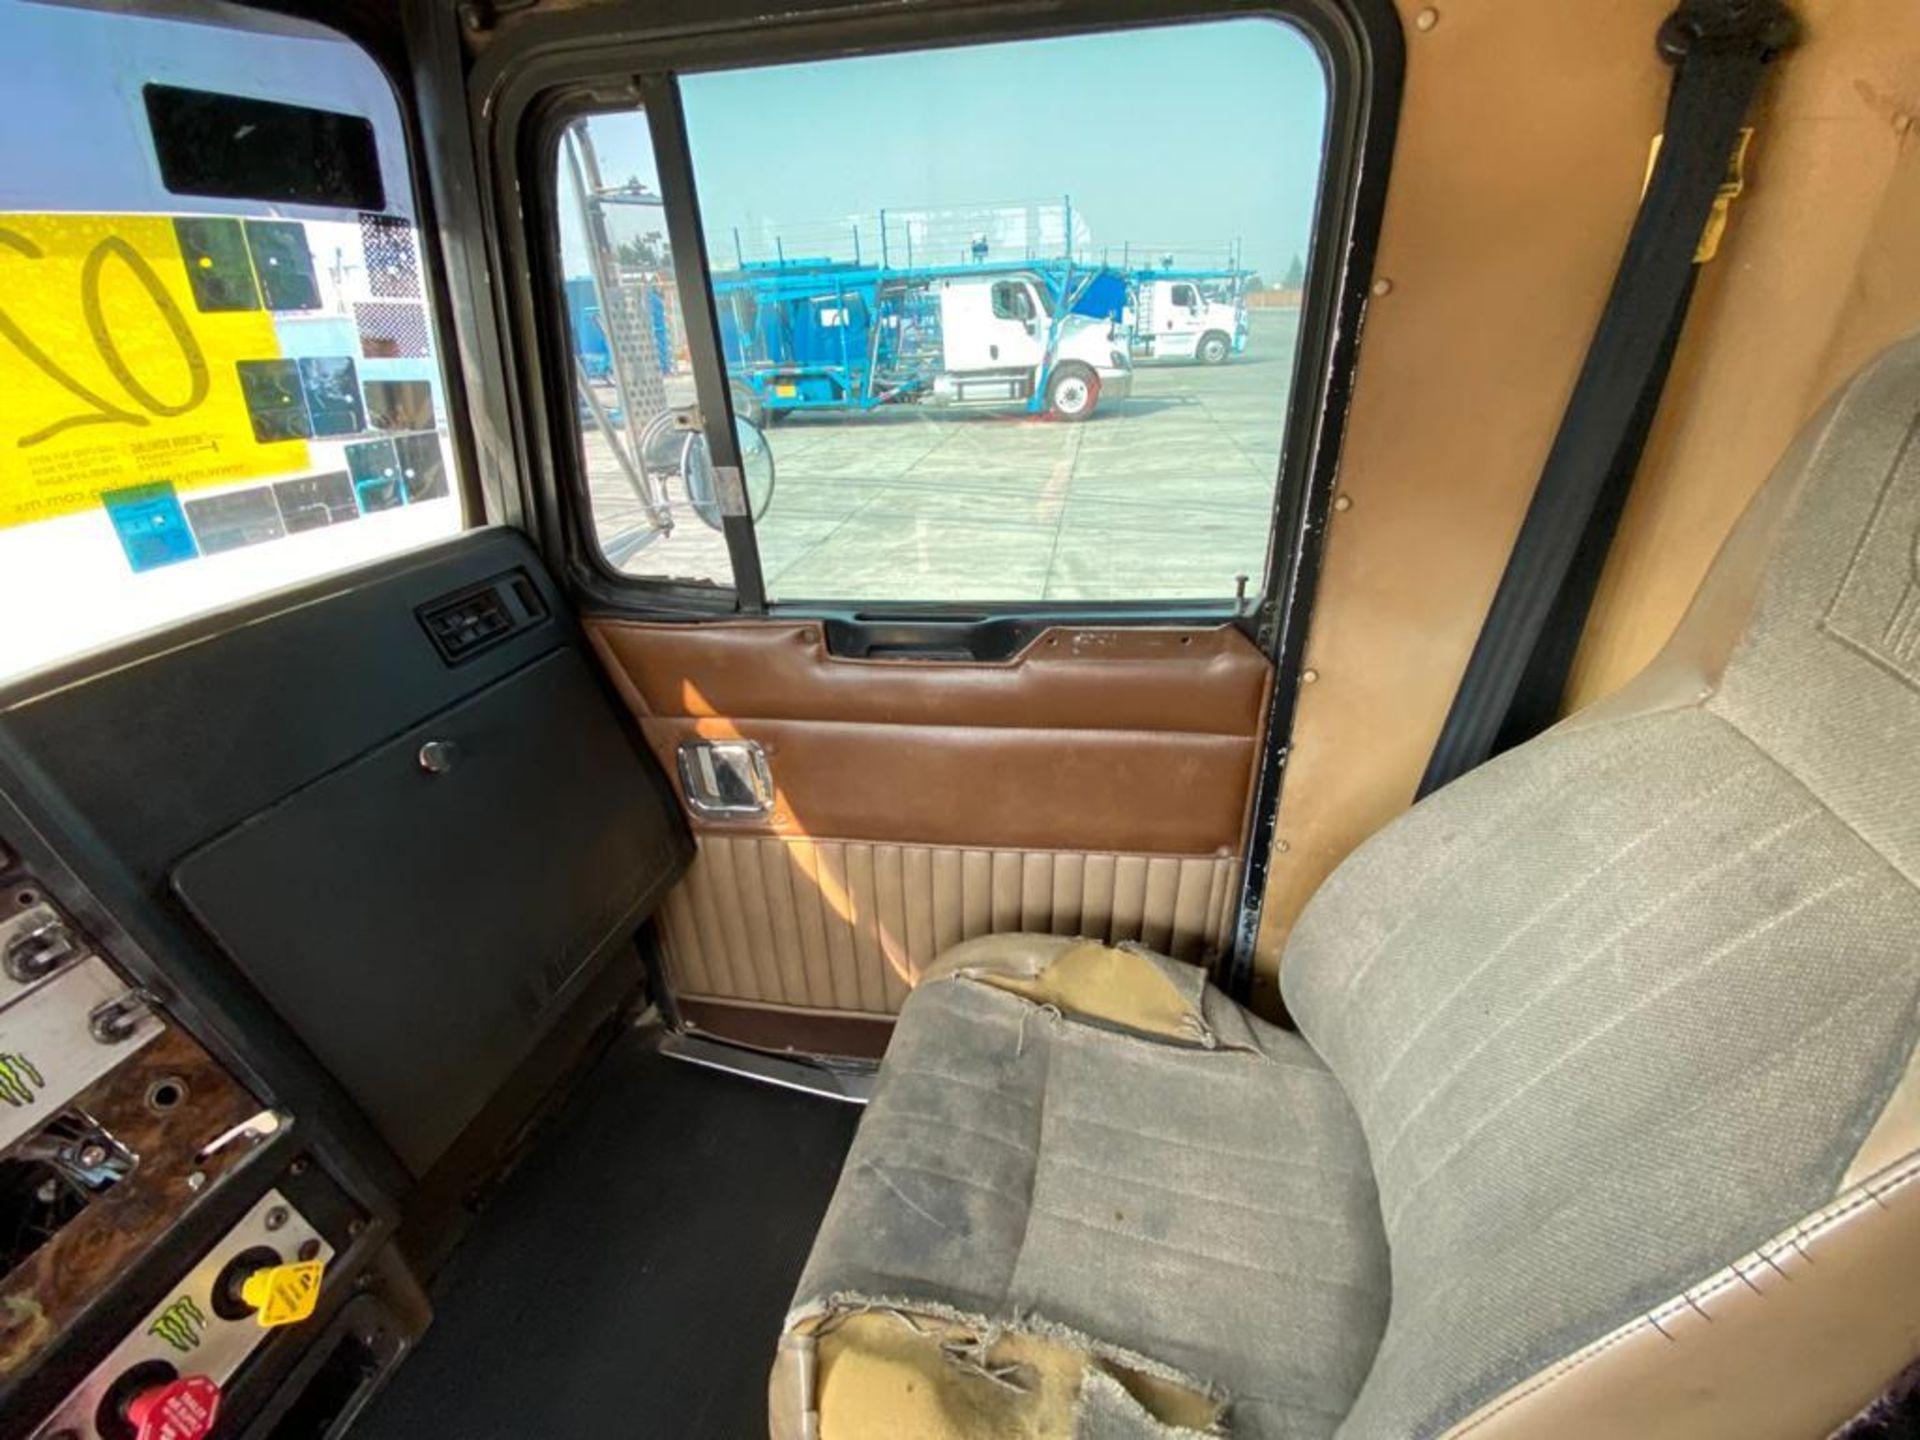 1999 Kenworth Sleeper truck tractor, standard transmission of 18 speeds - Image 41 of 75